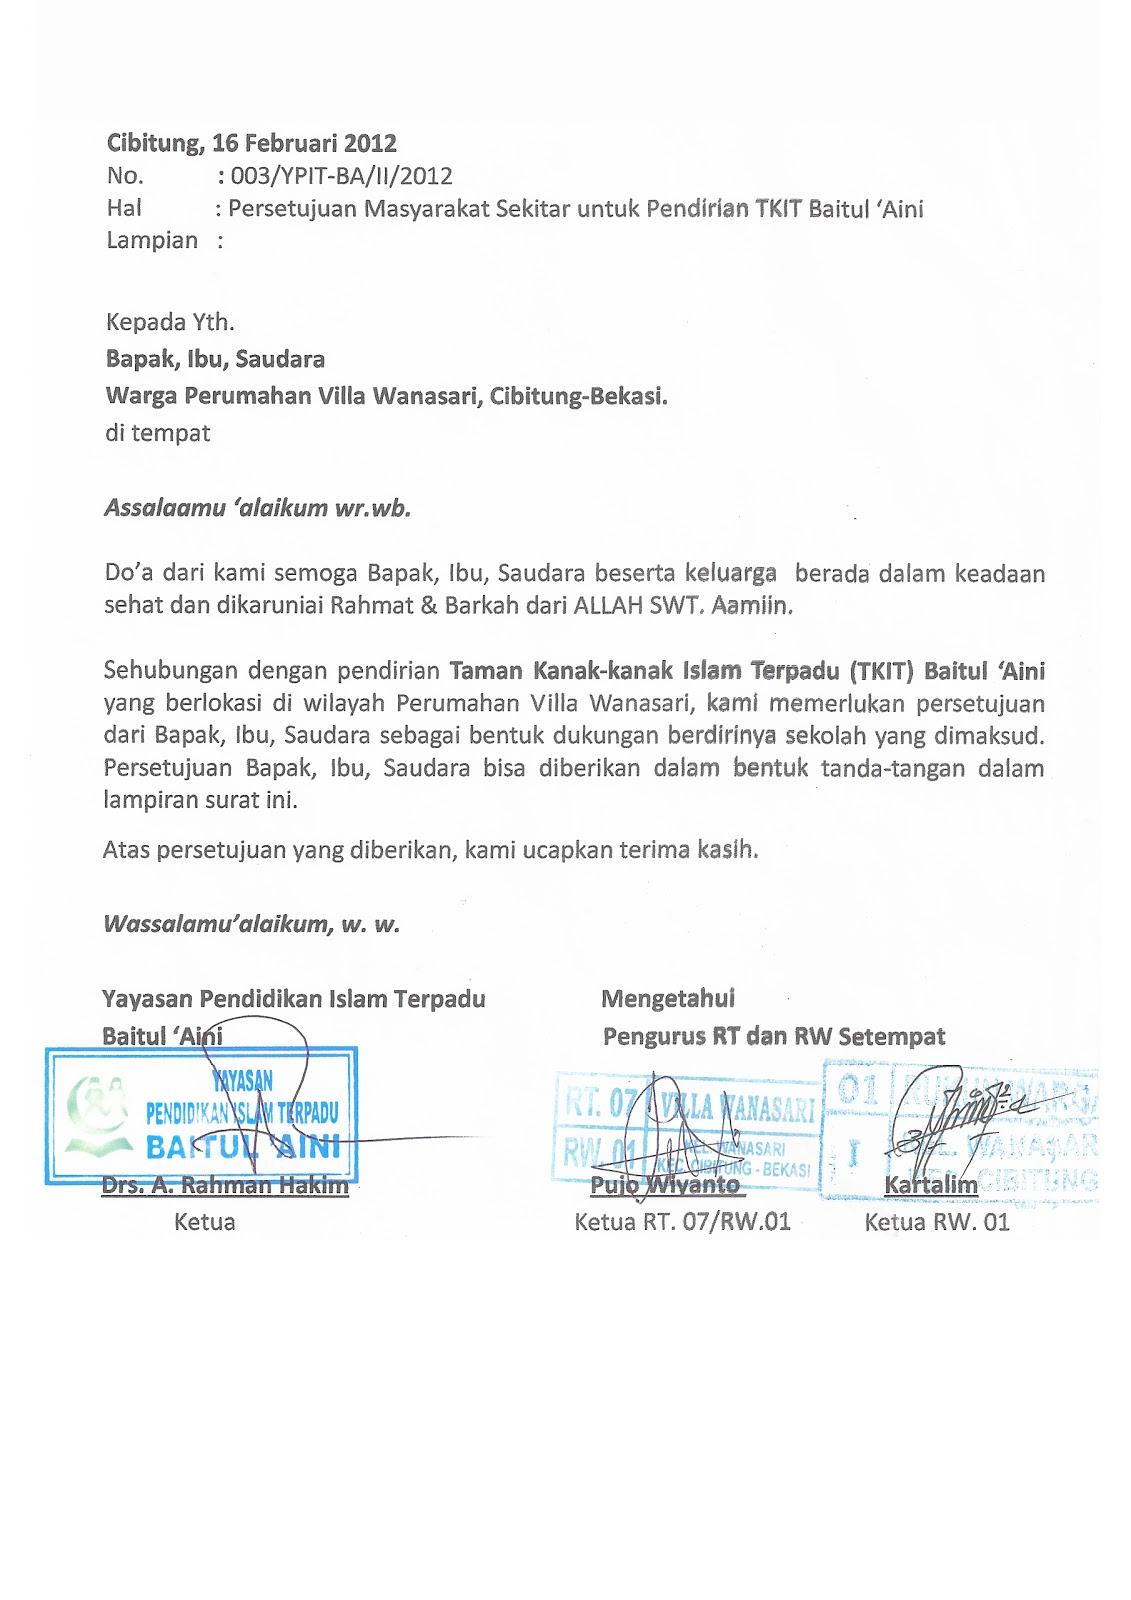 TKIT-TPQ BAITUL 'AINI: Contoh Format Persetujuan Warga ...